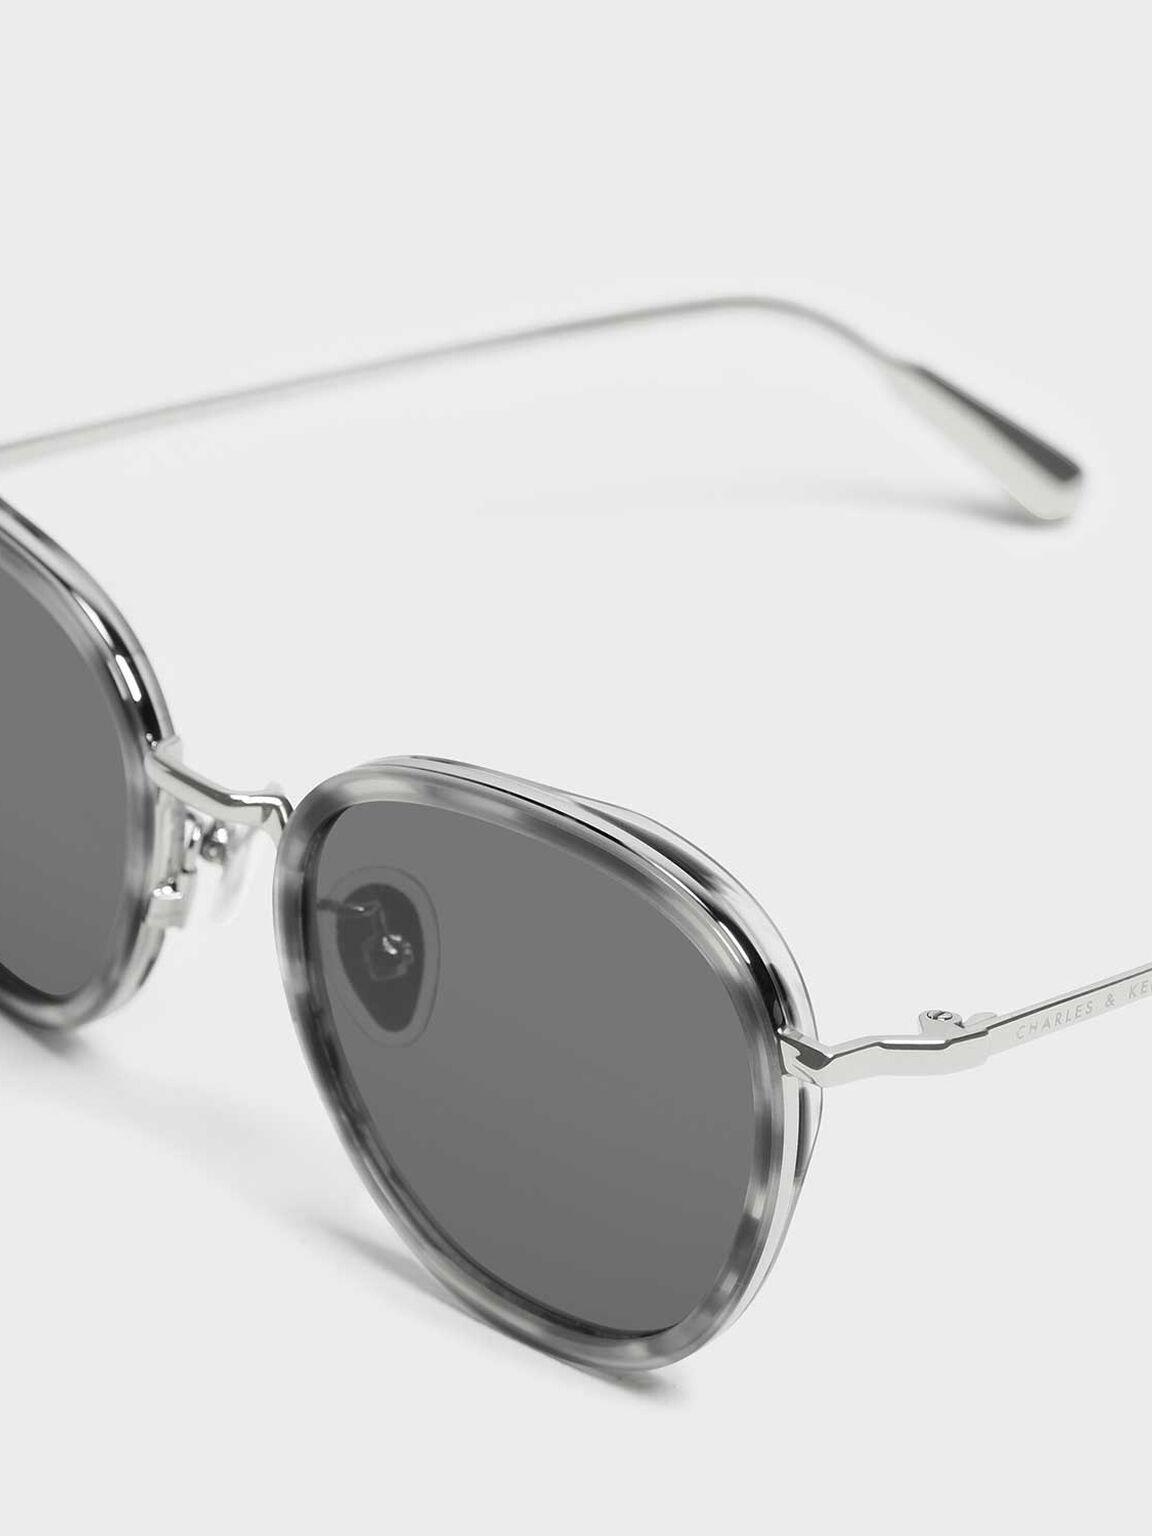 Semi-Precious Stone Sunglasses, Grey, hi-res